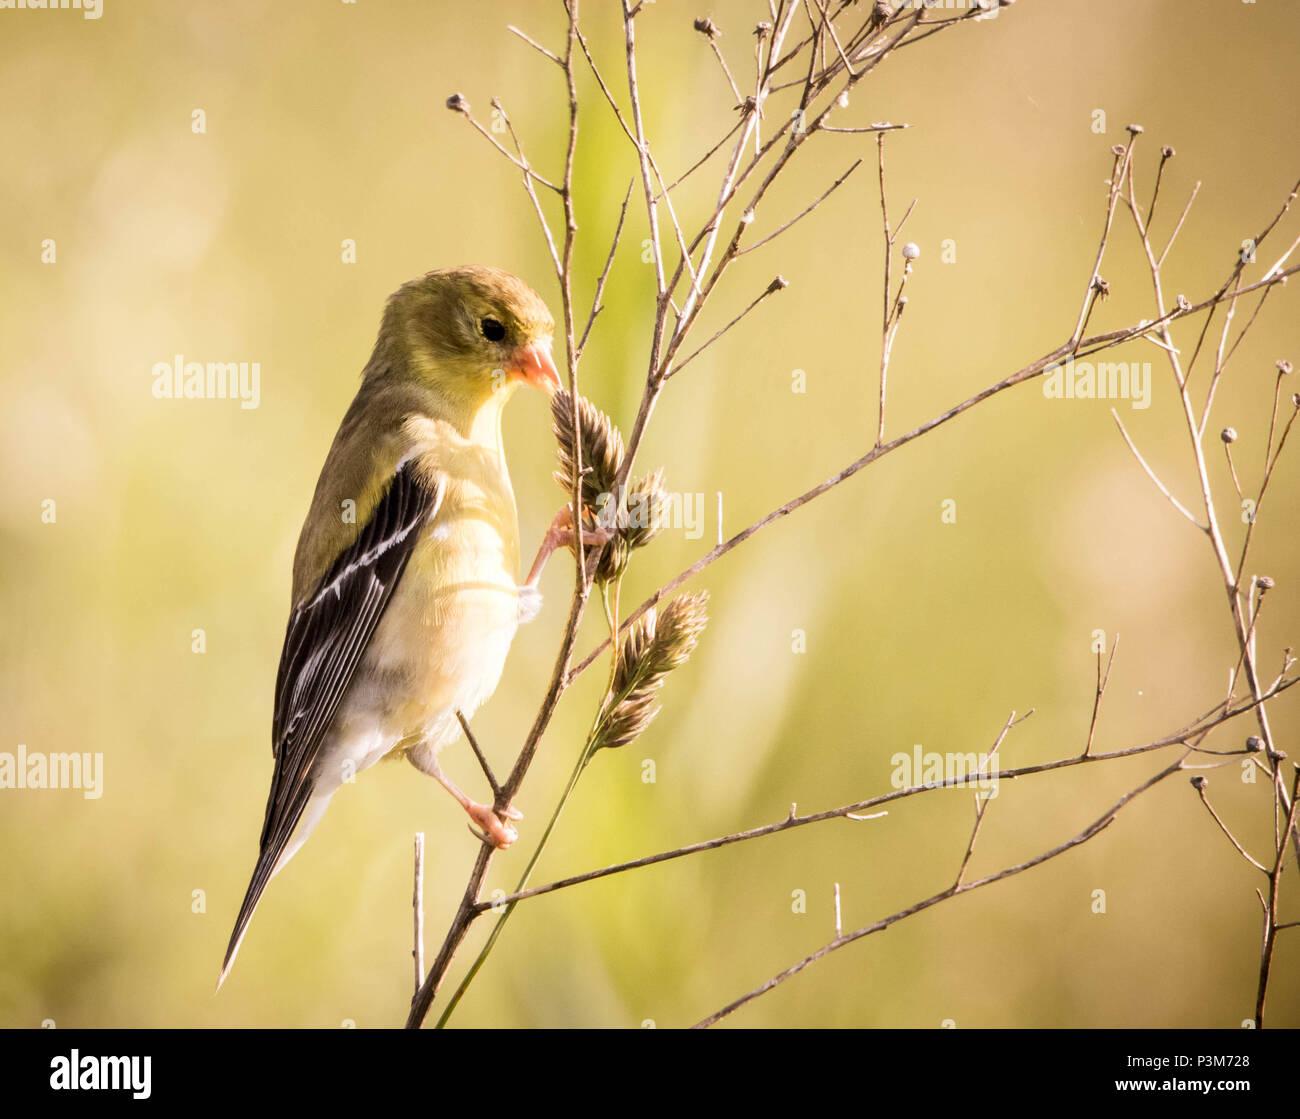 Golden Finch eating breakfast - Stock Image